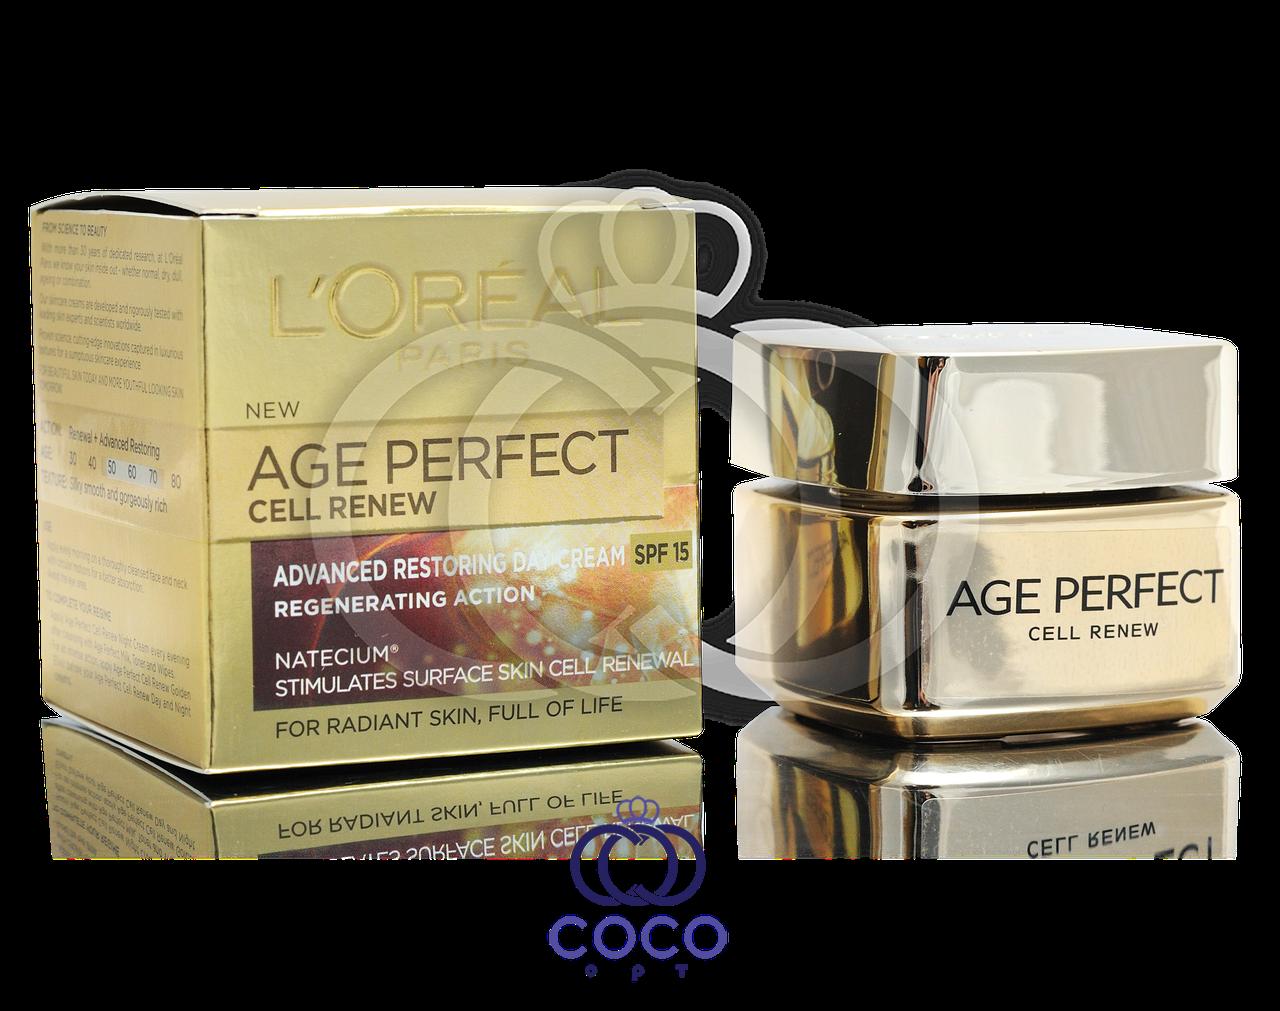 Дневной крем для лица Loreal Age Perfect Cell Renew